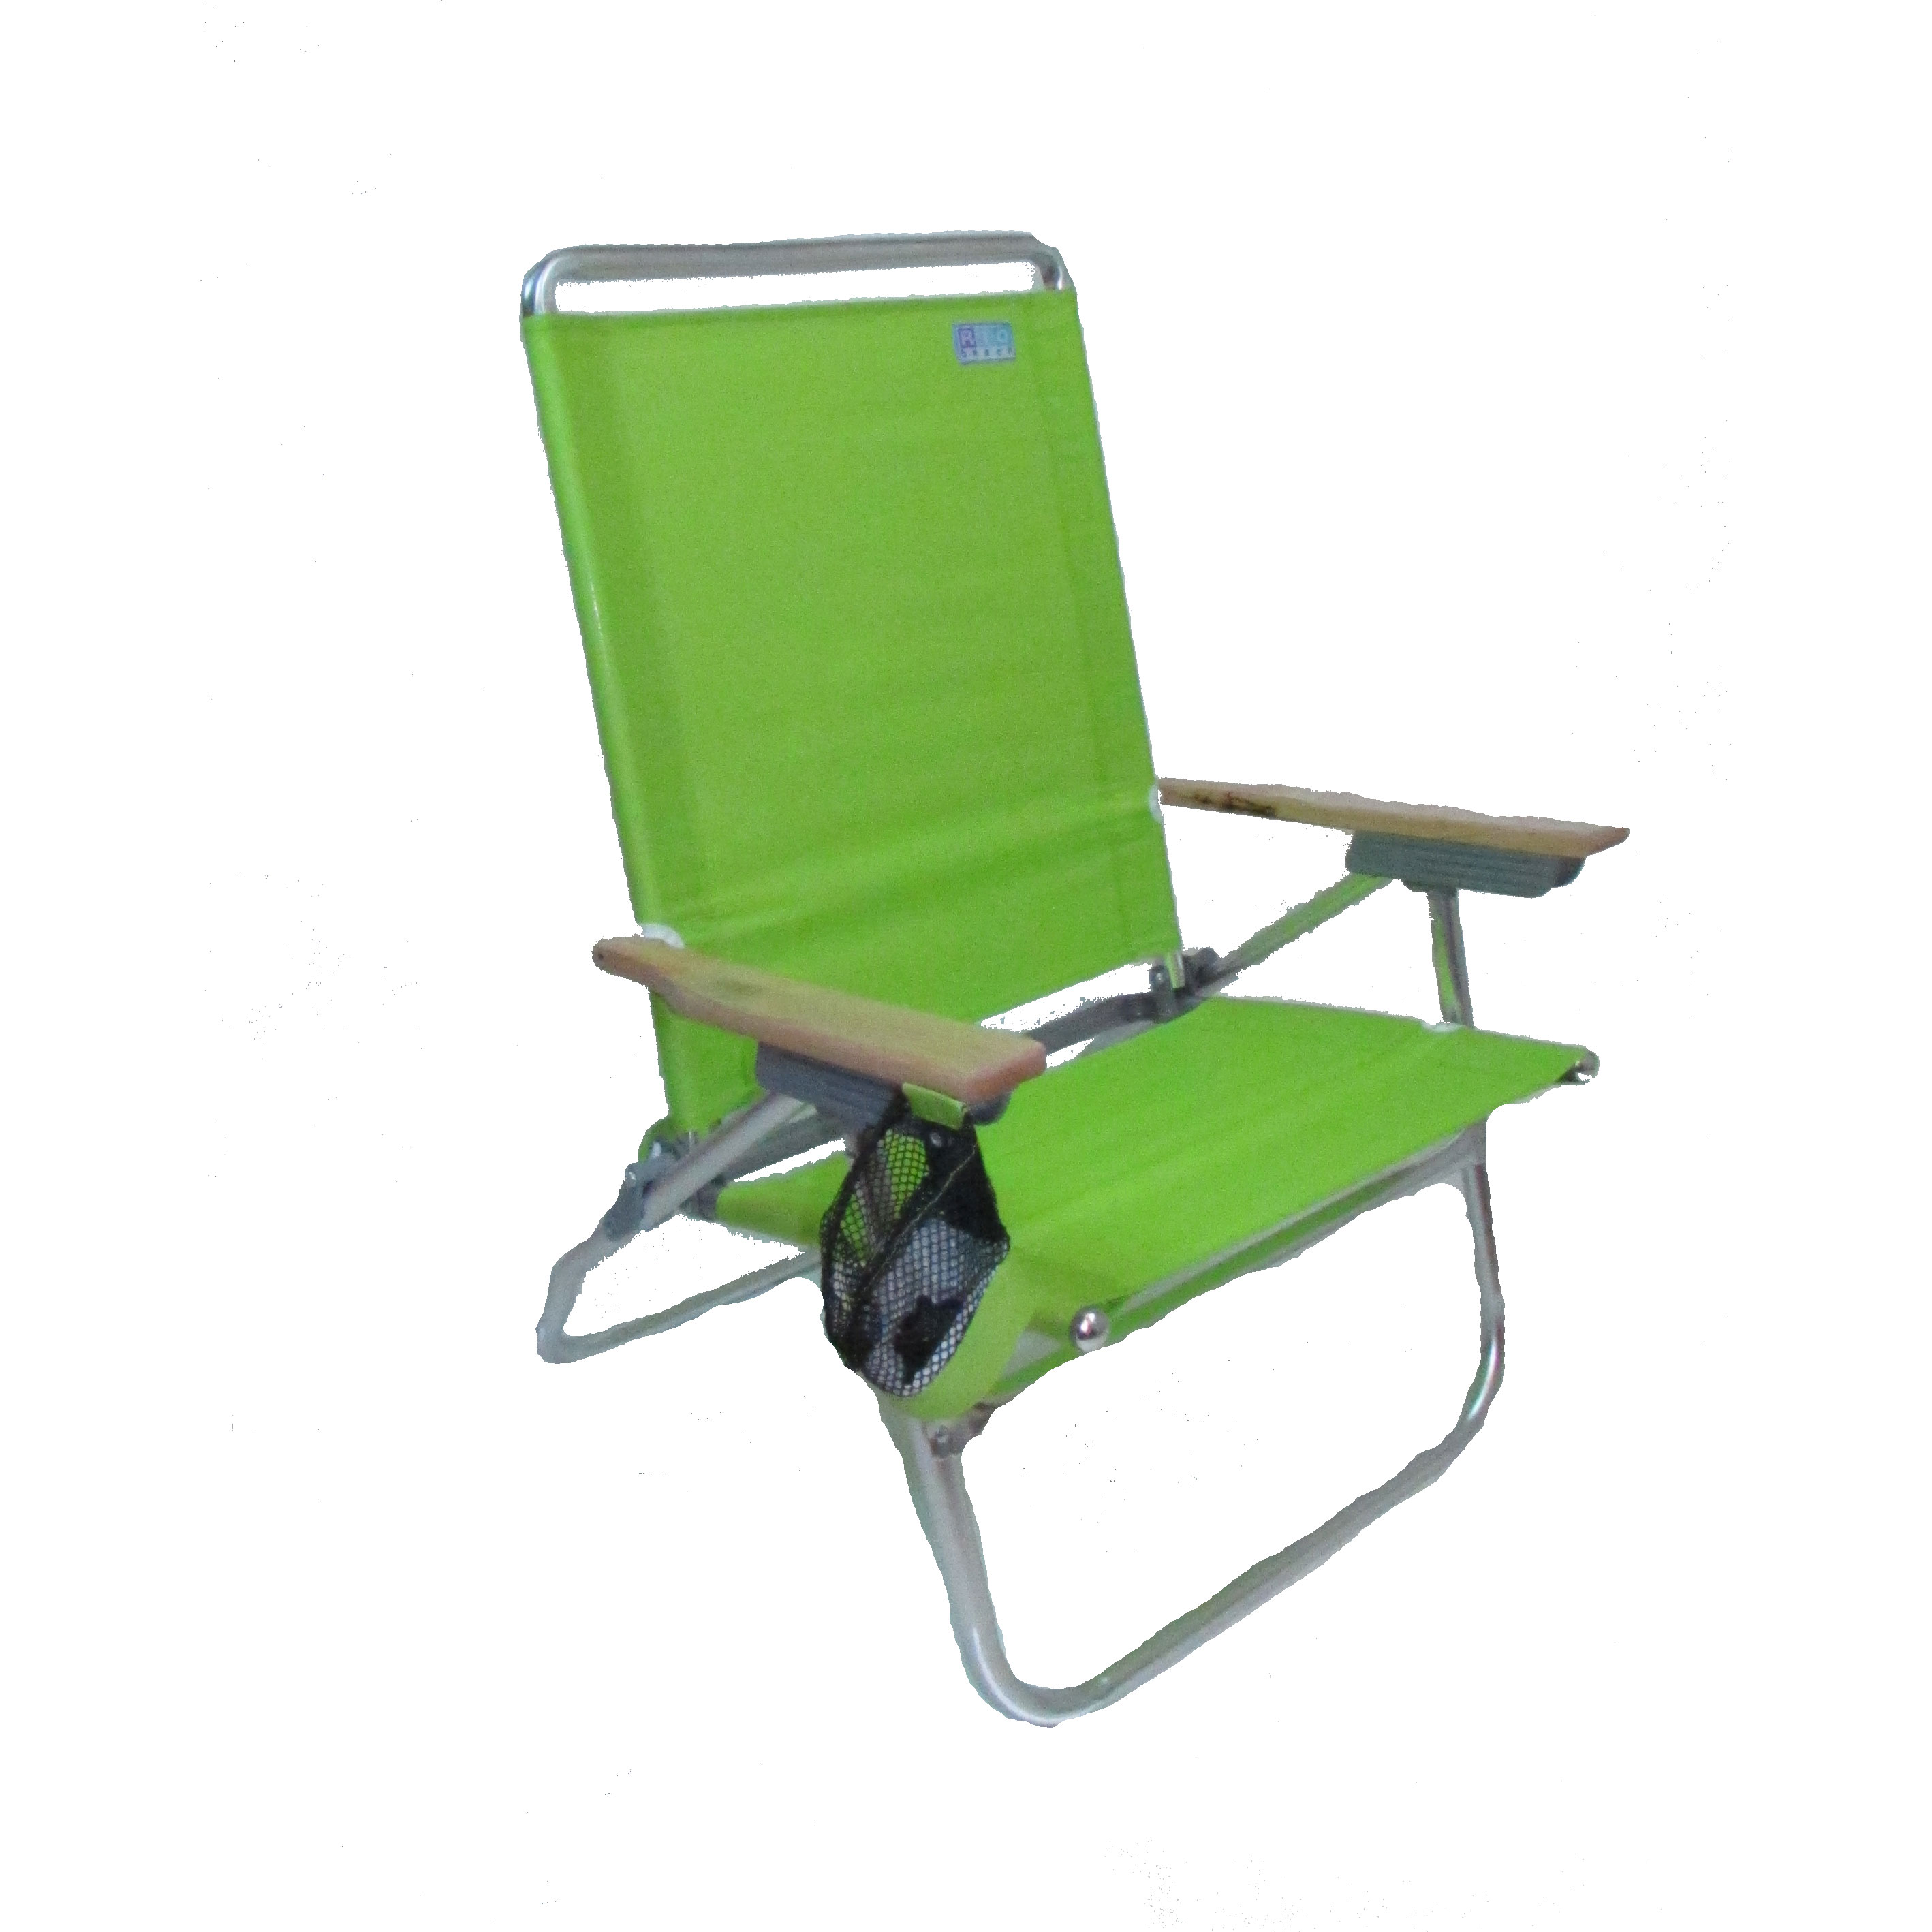 The Rio Beach 4 Position Easy In-Easy Out Beach Chair